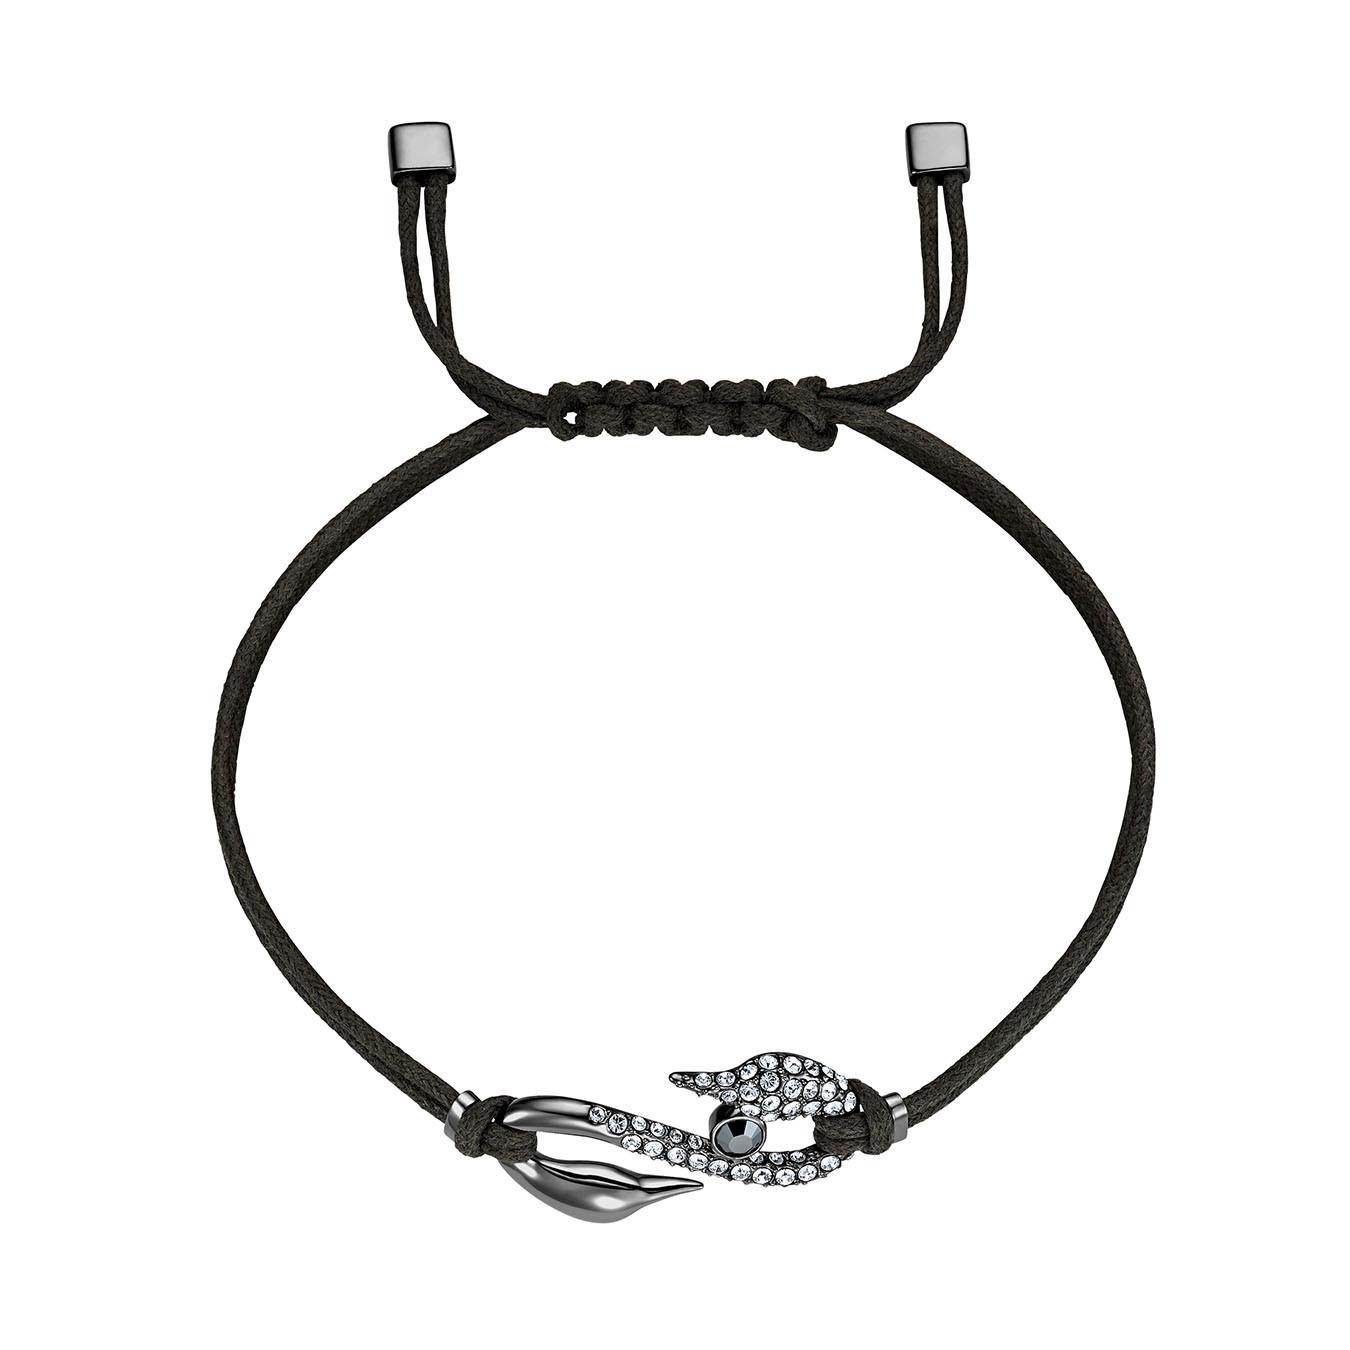 Swarovski Power Hook Bracelet